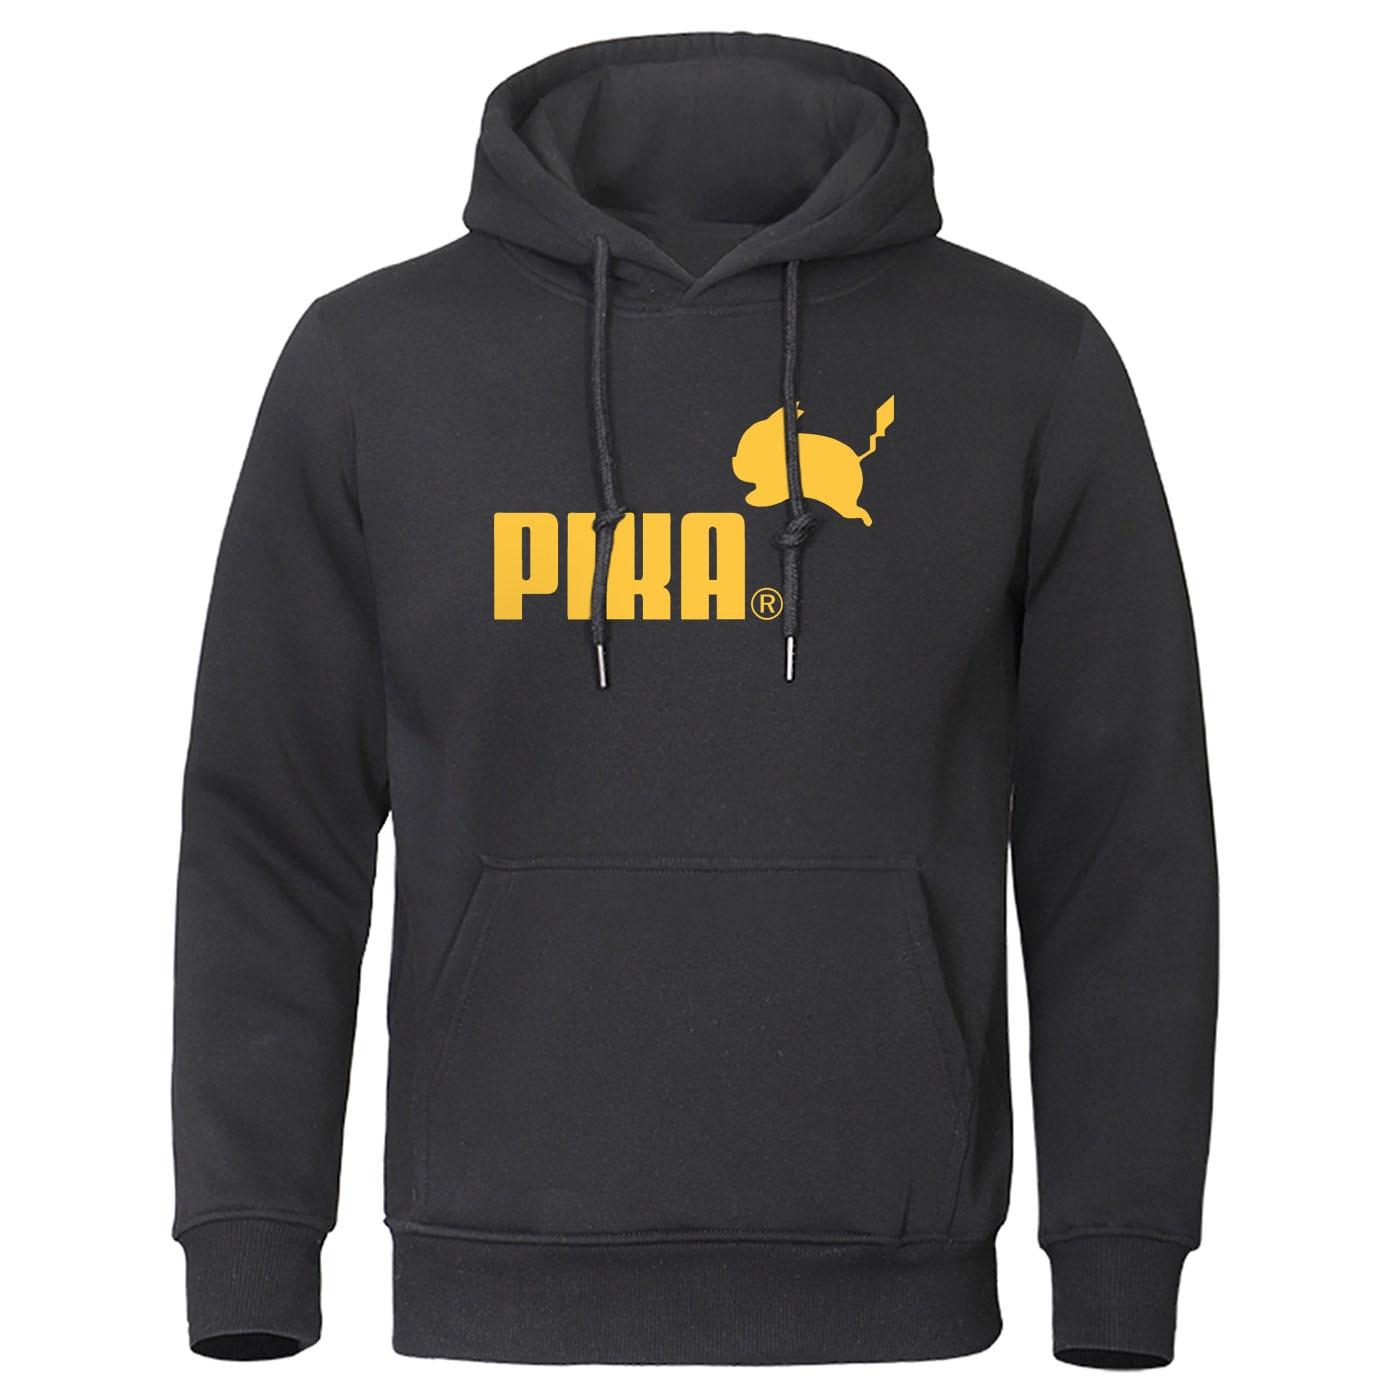 2019 Autumn Pika Hoodies Japanese Anime Pokemon Men Pullover Pikachu Boy Sweatshirt Fleece Warm Men's Casual Streetwear Hoody